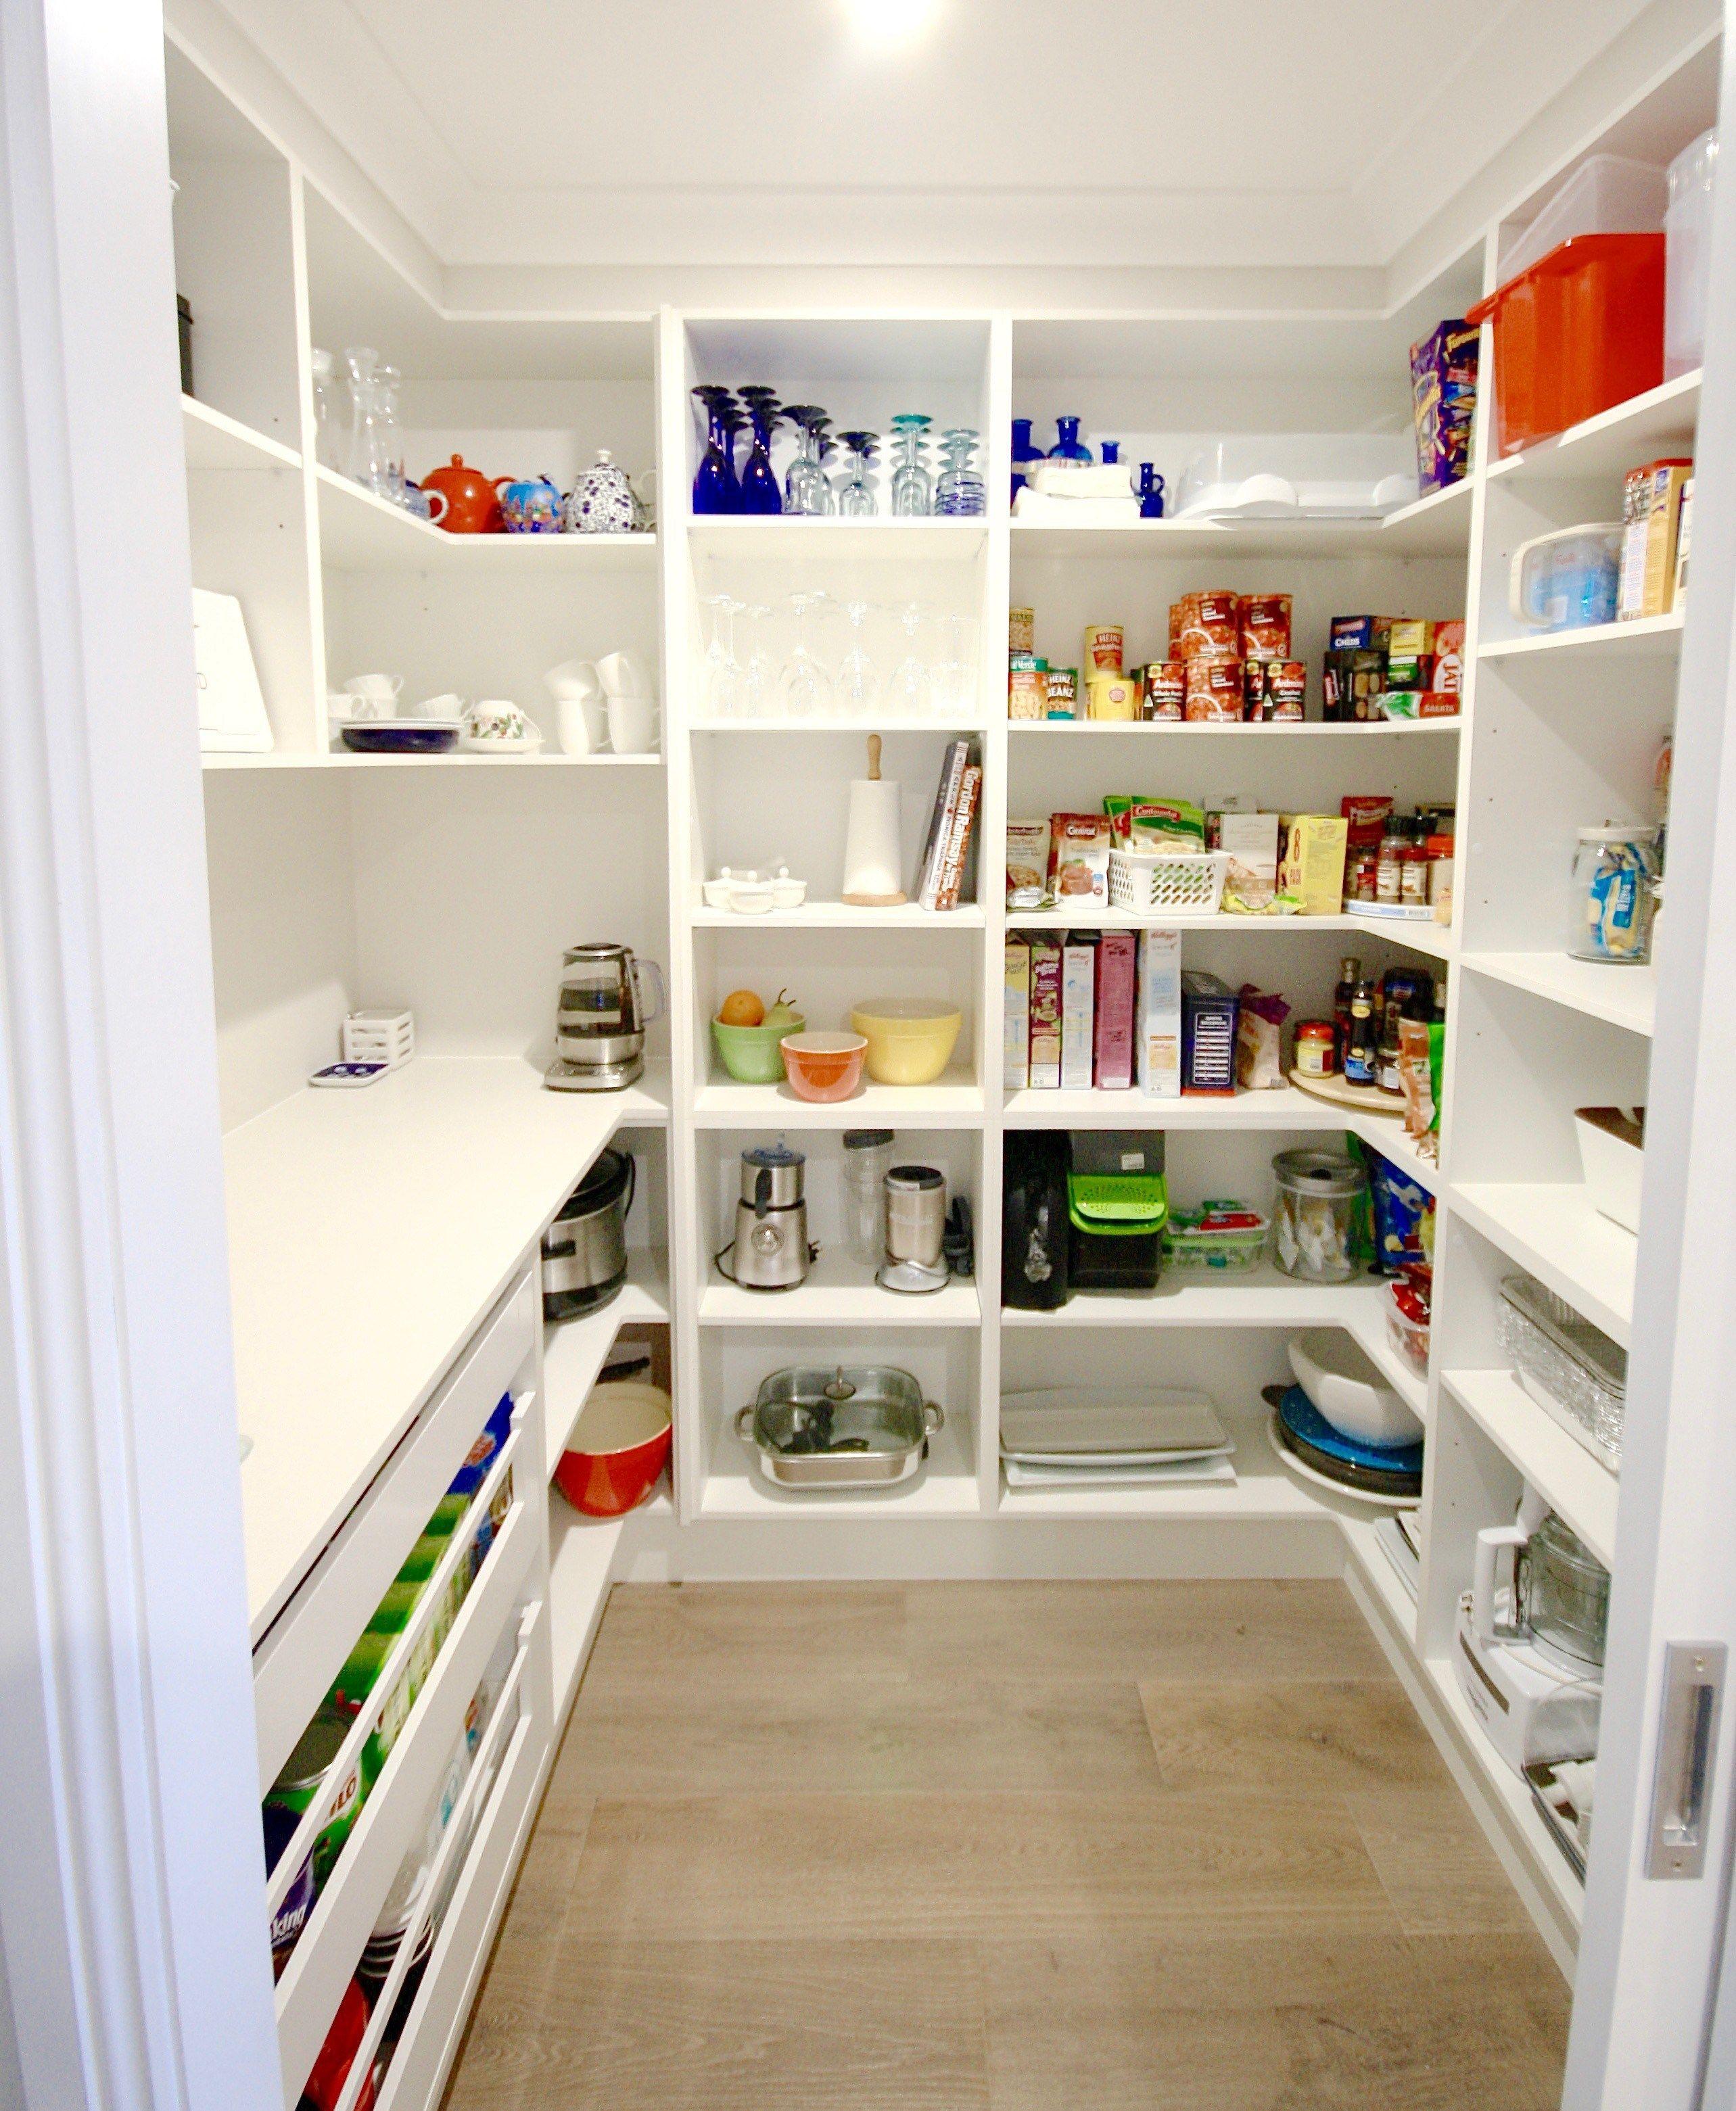 Large Pantry With Freezer Refrigerators Lovely Large Pantry With Freezer Refrigerators Traditional Shaker Pantry Layout Pantry Design Kitchen Pantry Design